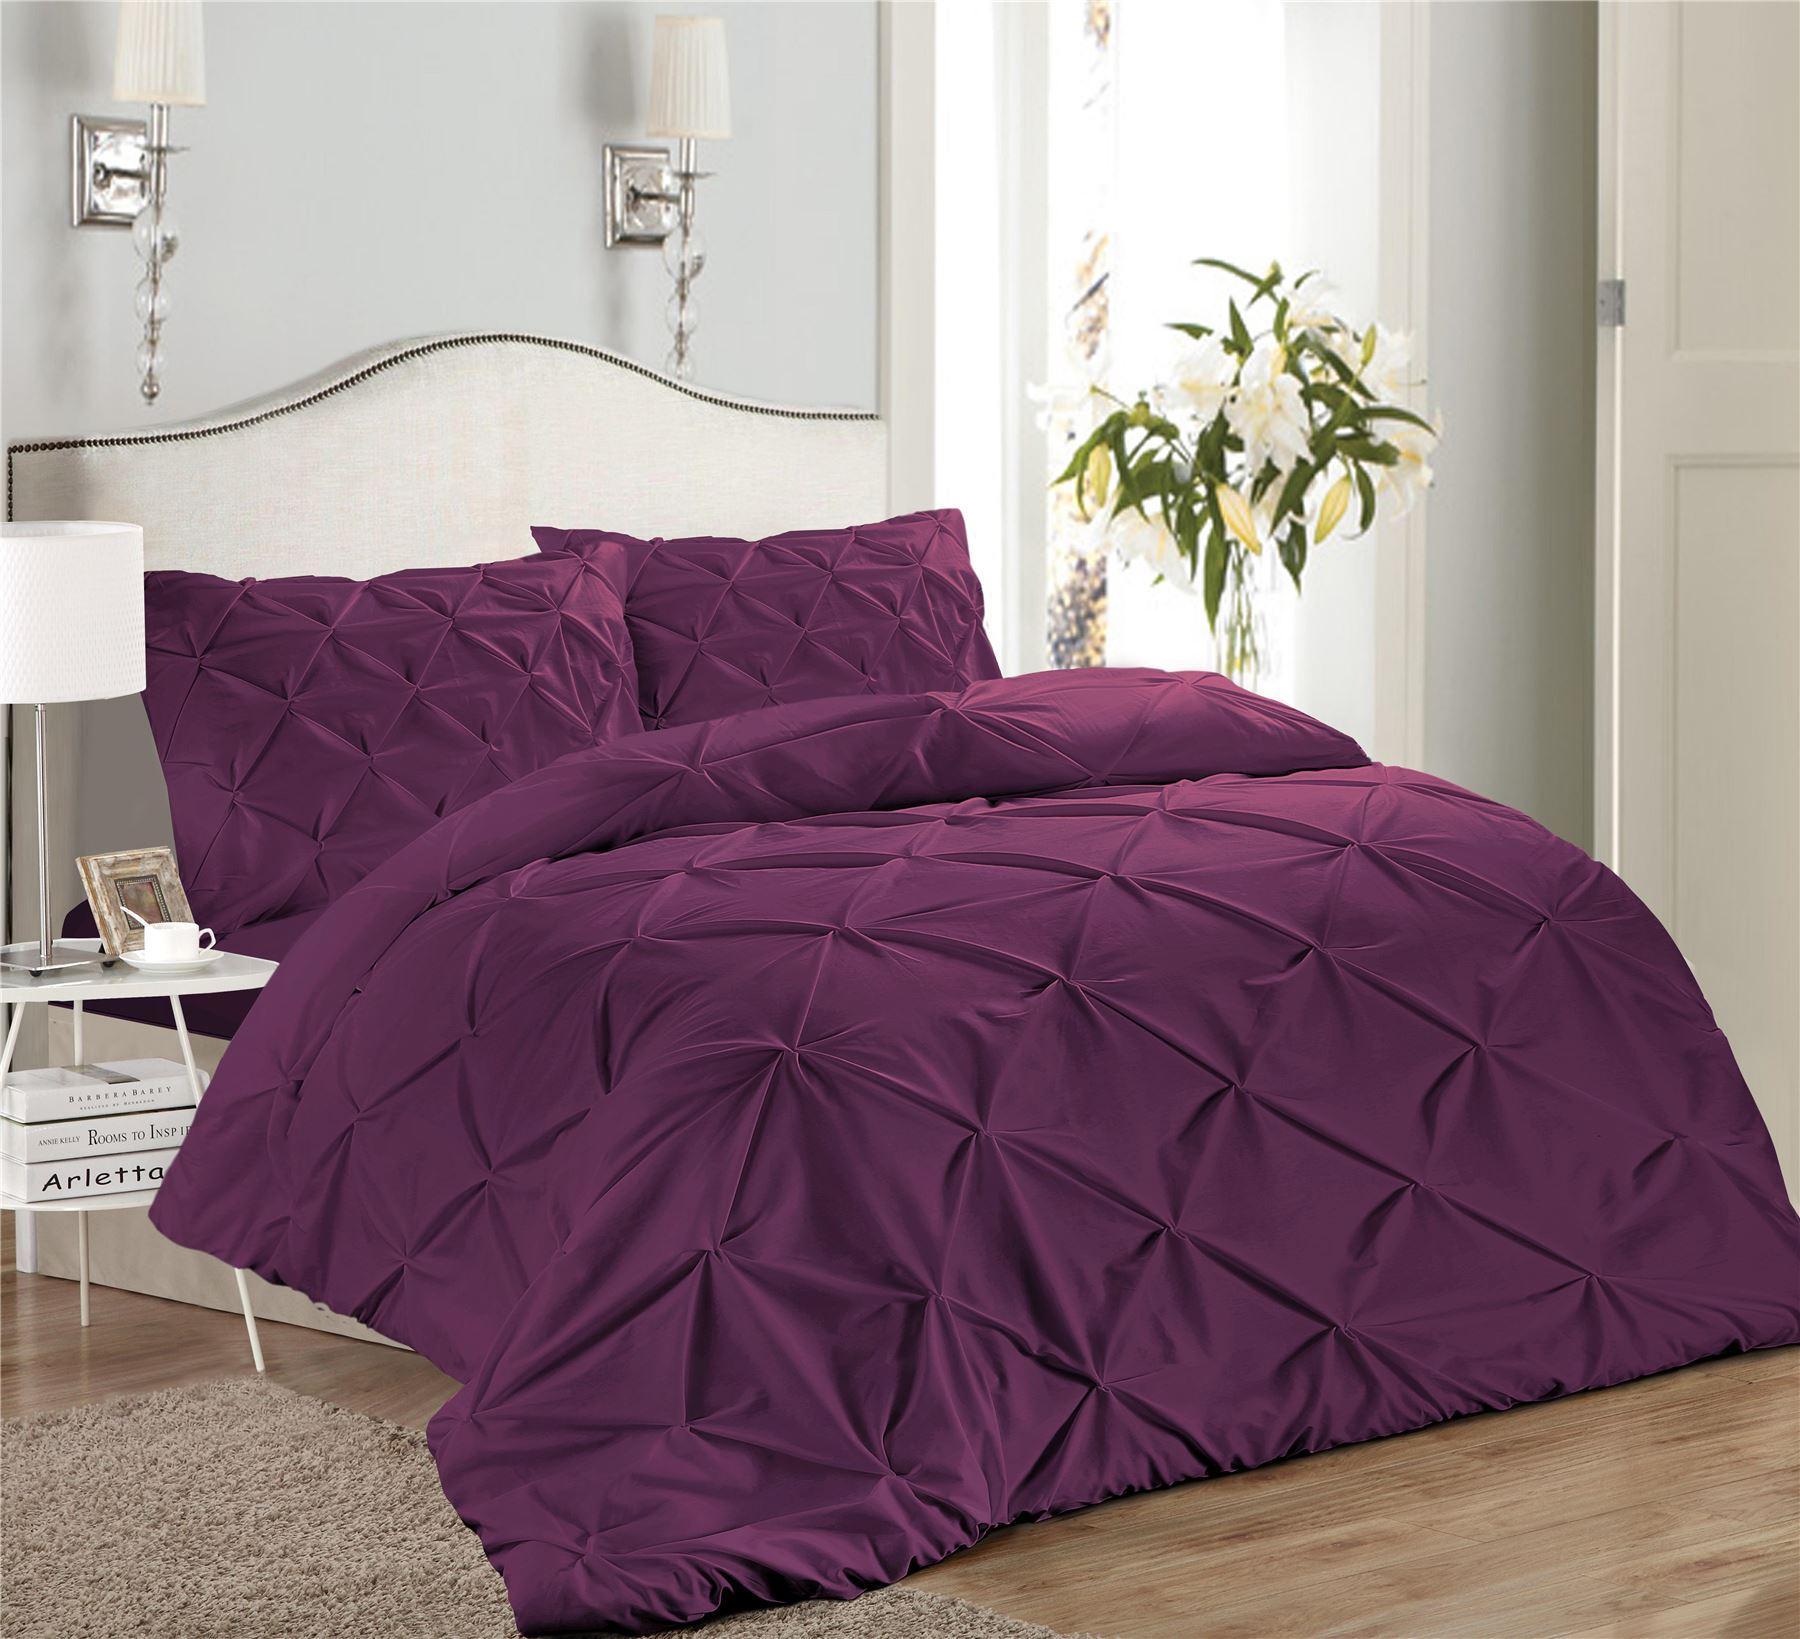 Luxury-Pure-100-Cotton-200-Thread-Pinch-Pleat-Pintuck-Puckering-Duvet-Cover-Set thumbnail 30